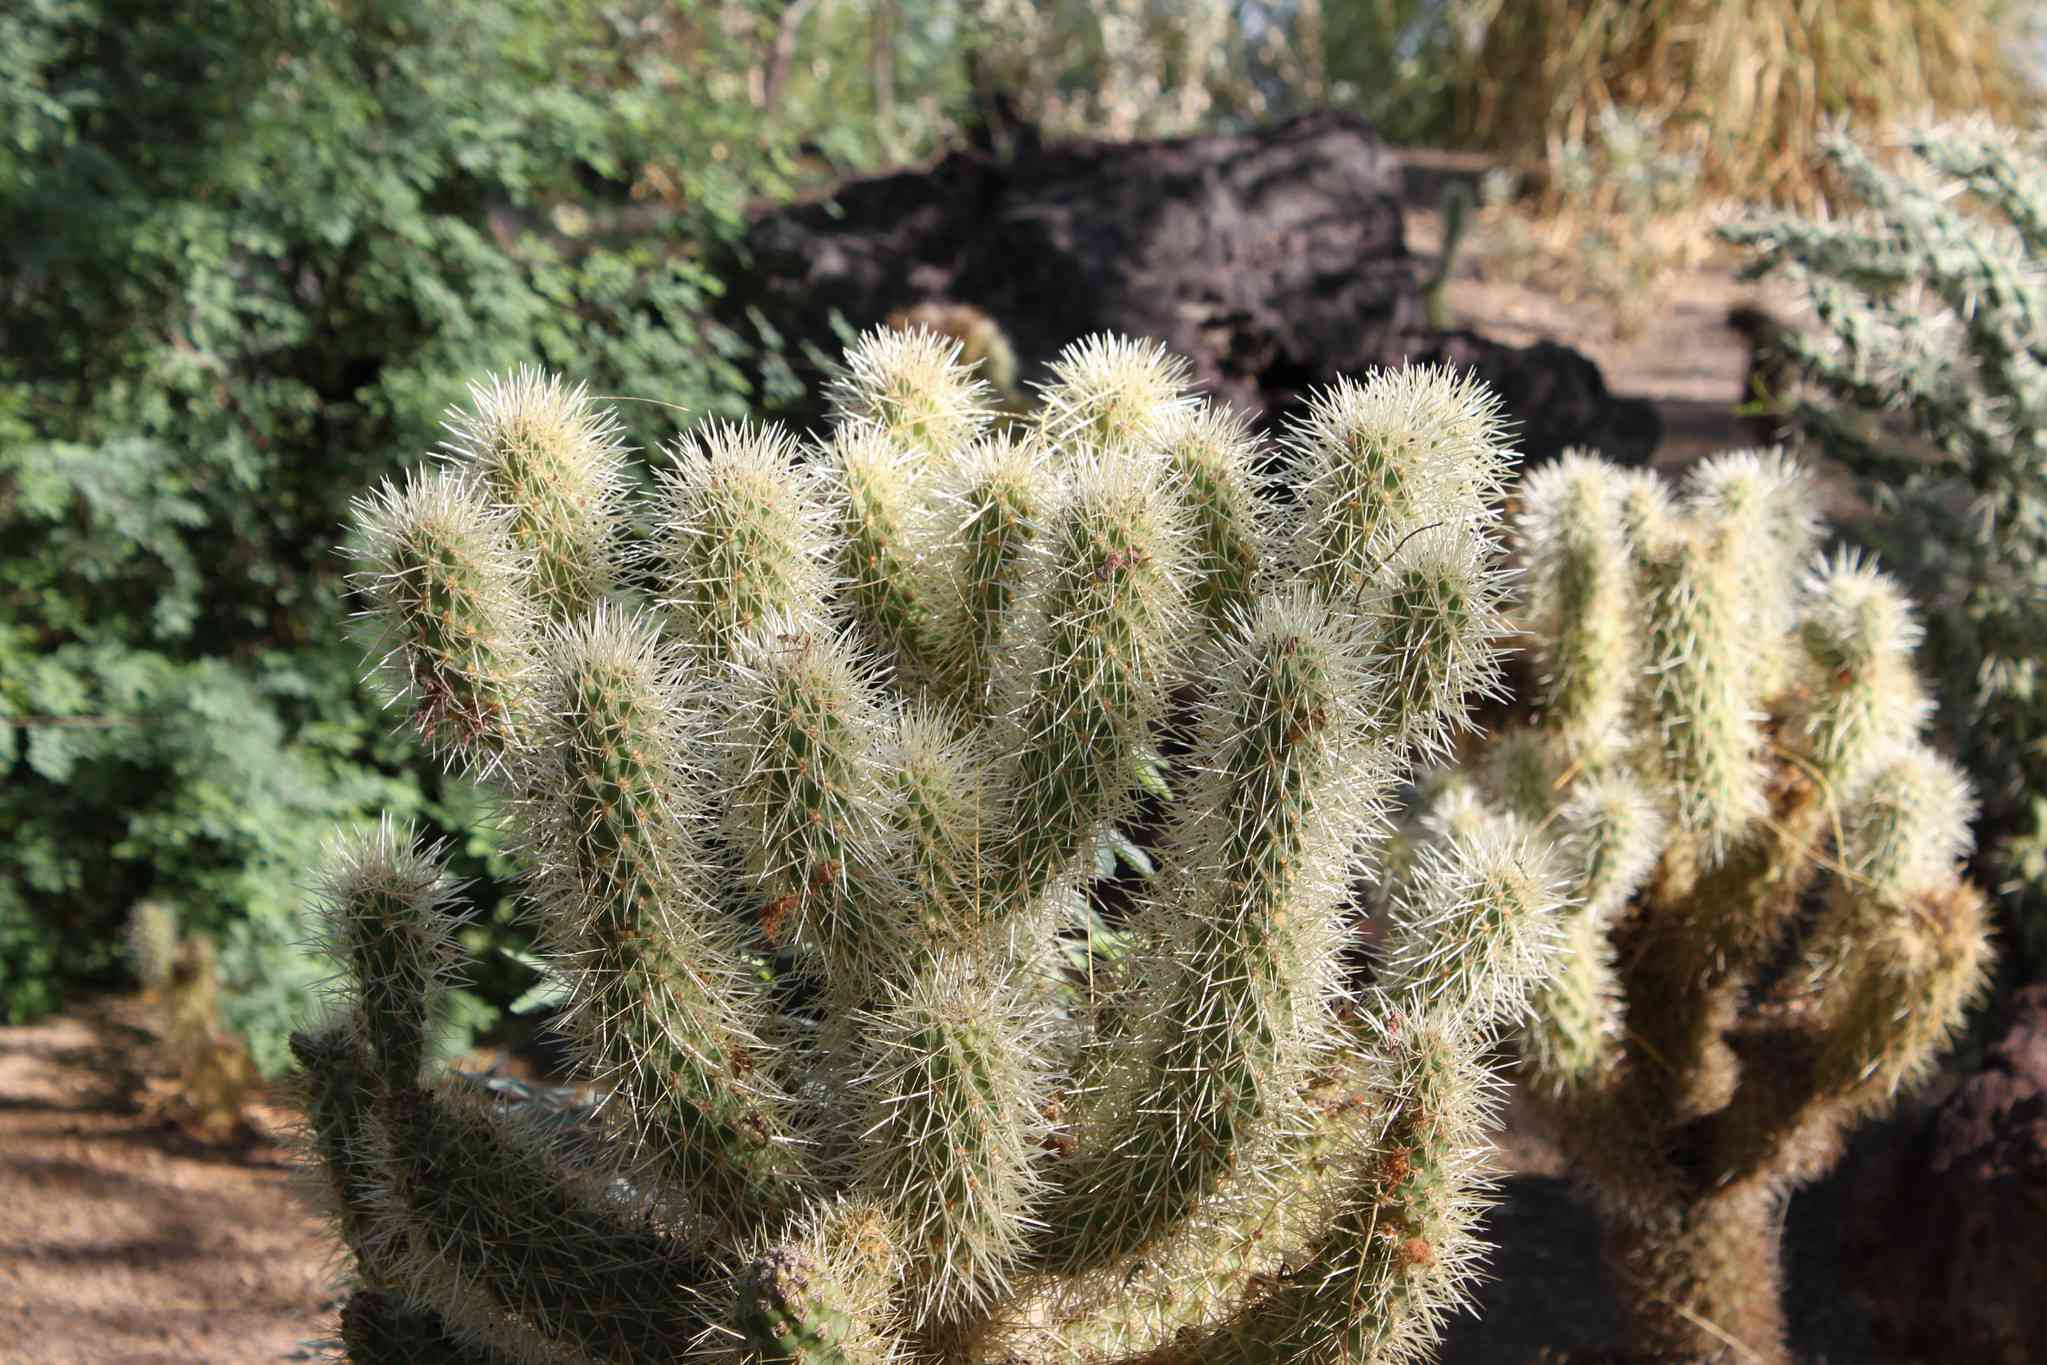 Ethel M. Chocolates Botanical Cactus Garden